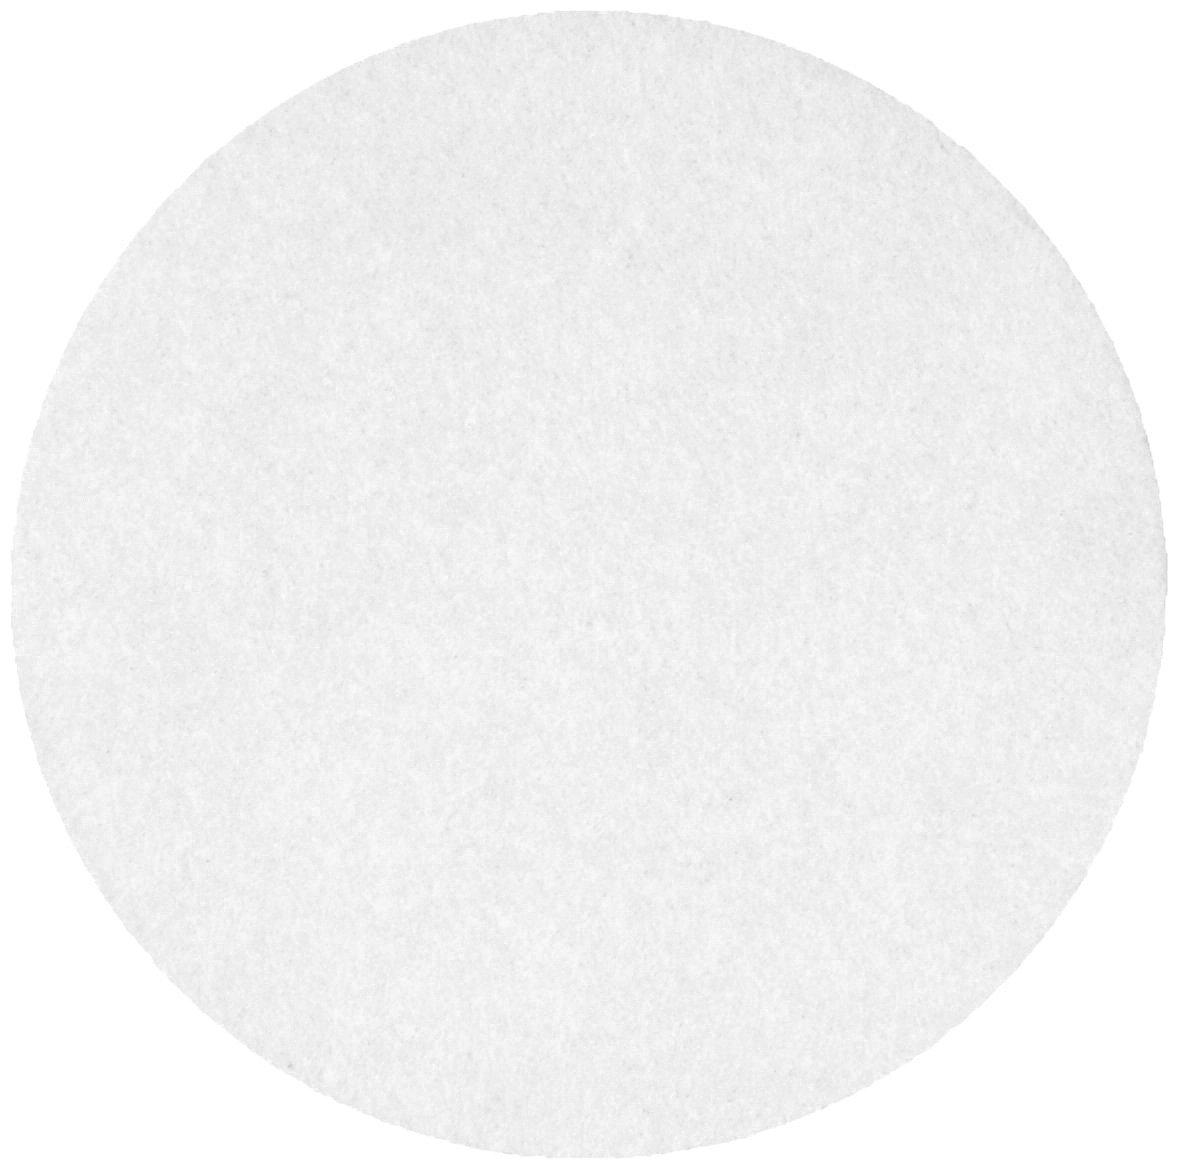 Whatman 10300214 Ashless Quantitative Filter Paper, 185mm Diameter, 2 Micron, Grade 589/3 (Pack of 100)